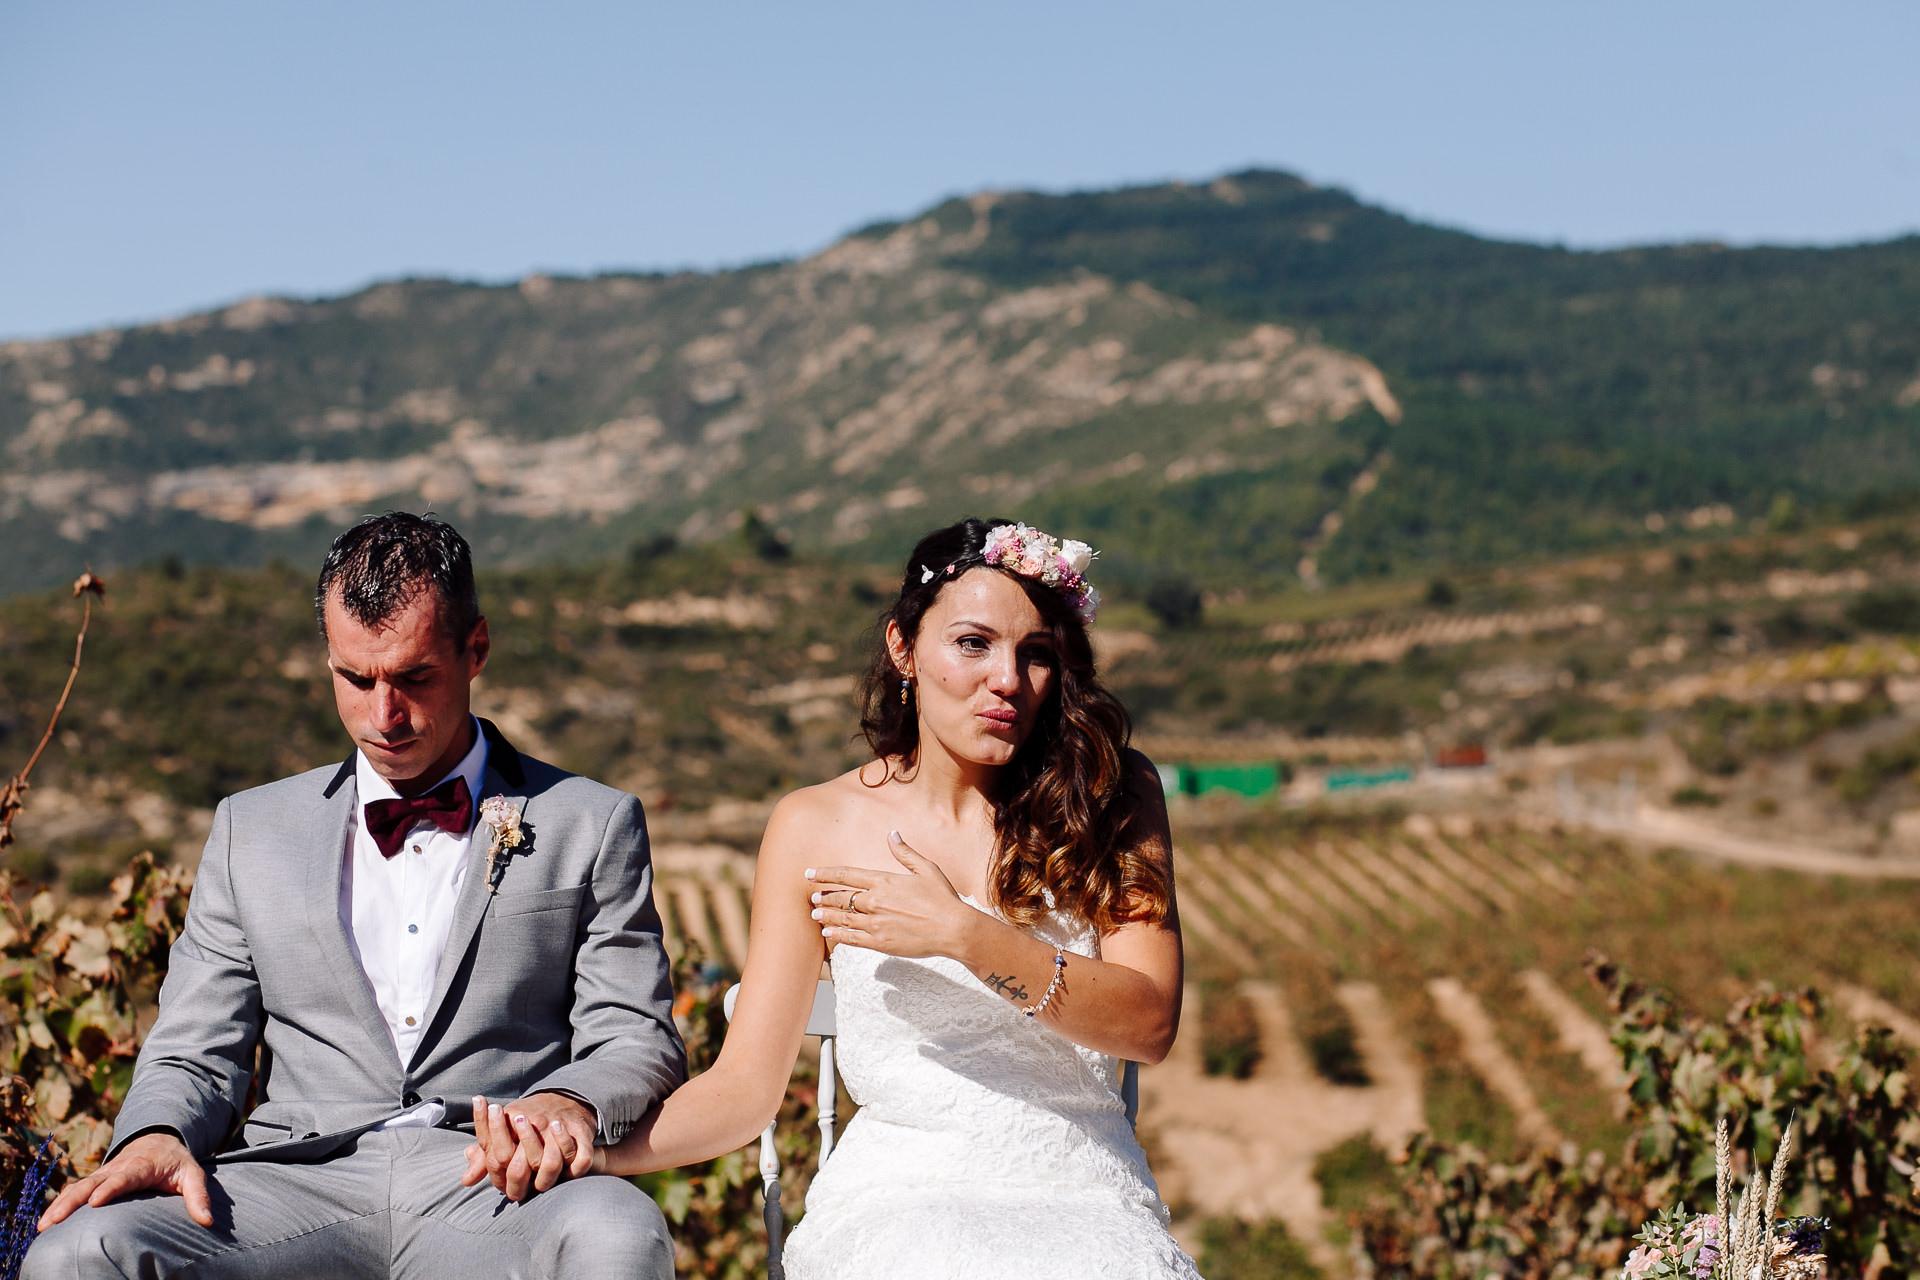 boda civil vinedos larioja lola berantevilla 133822